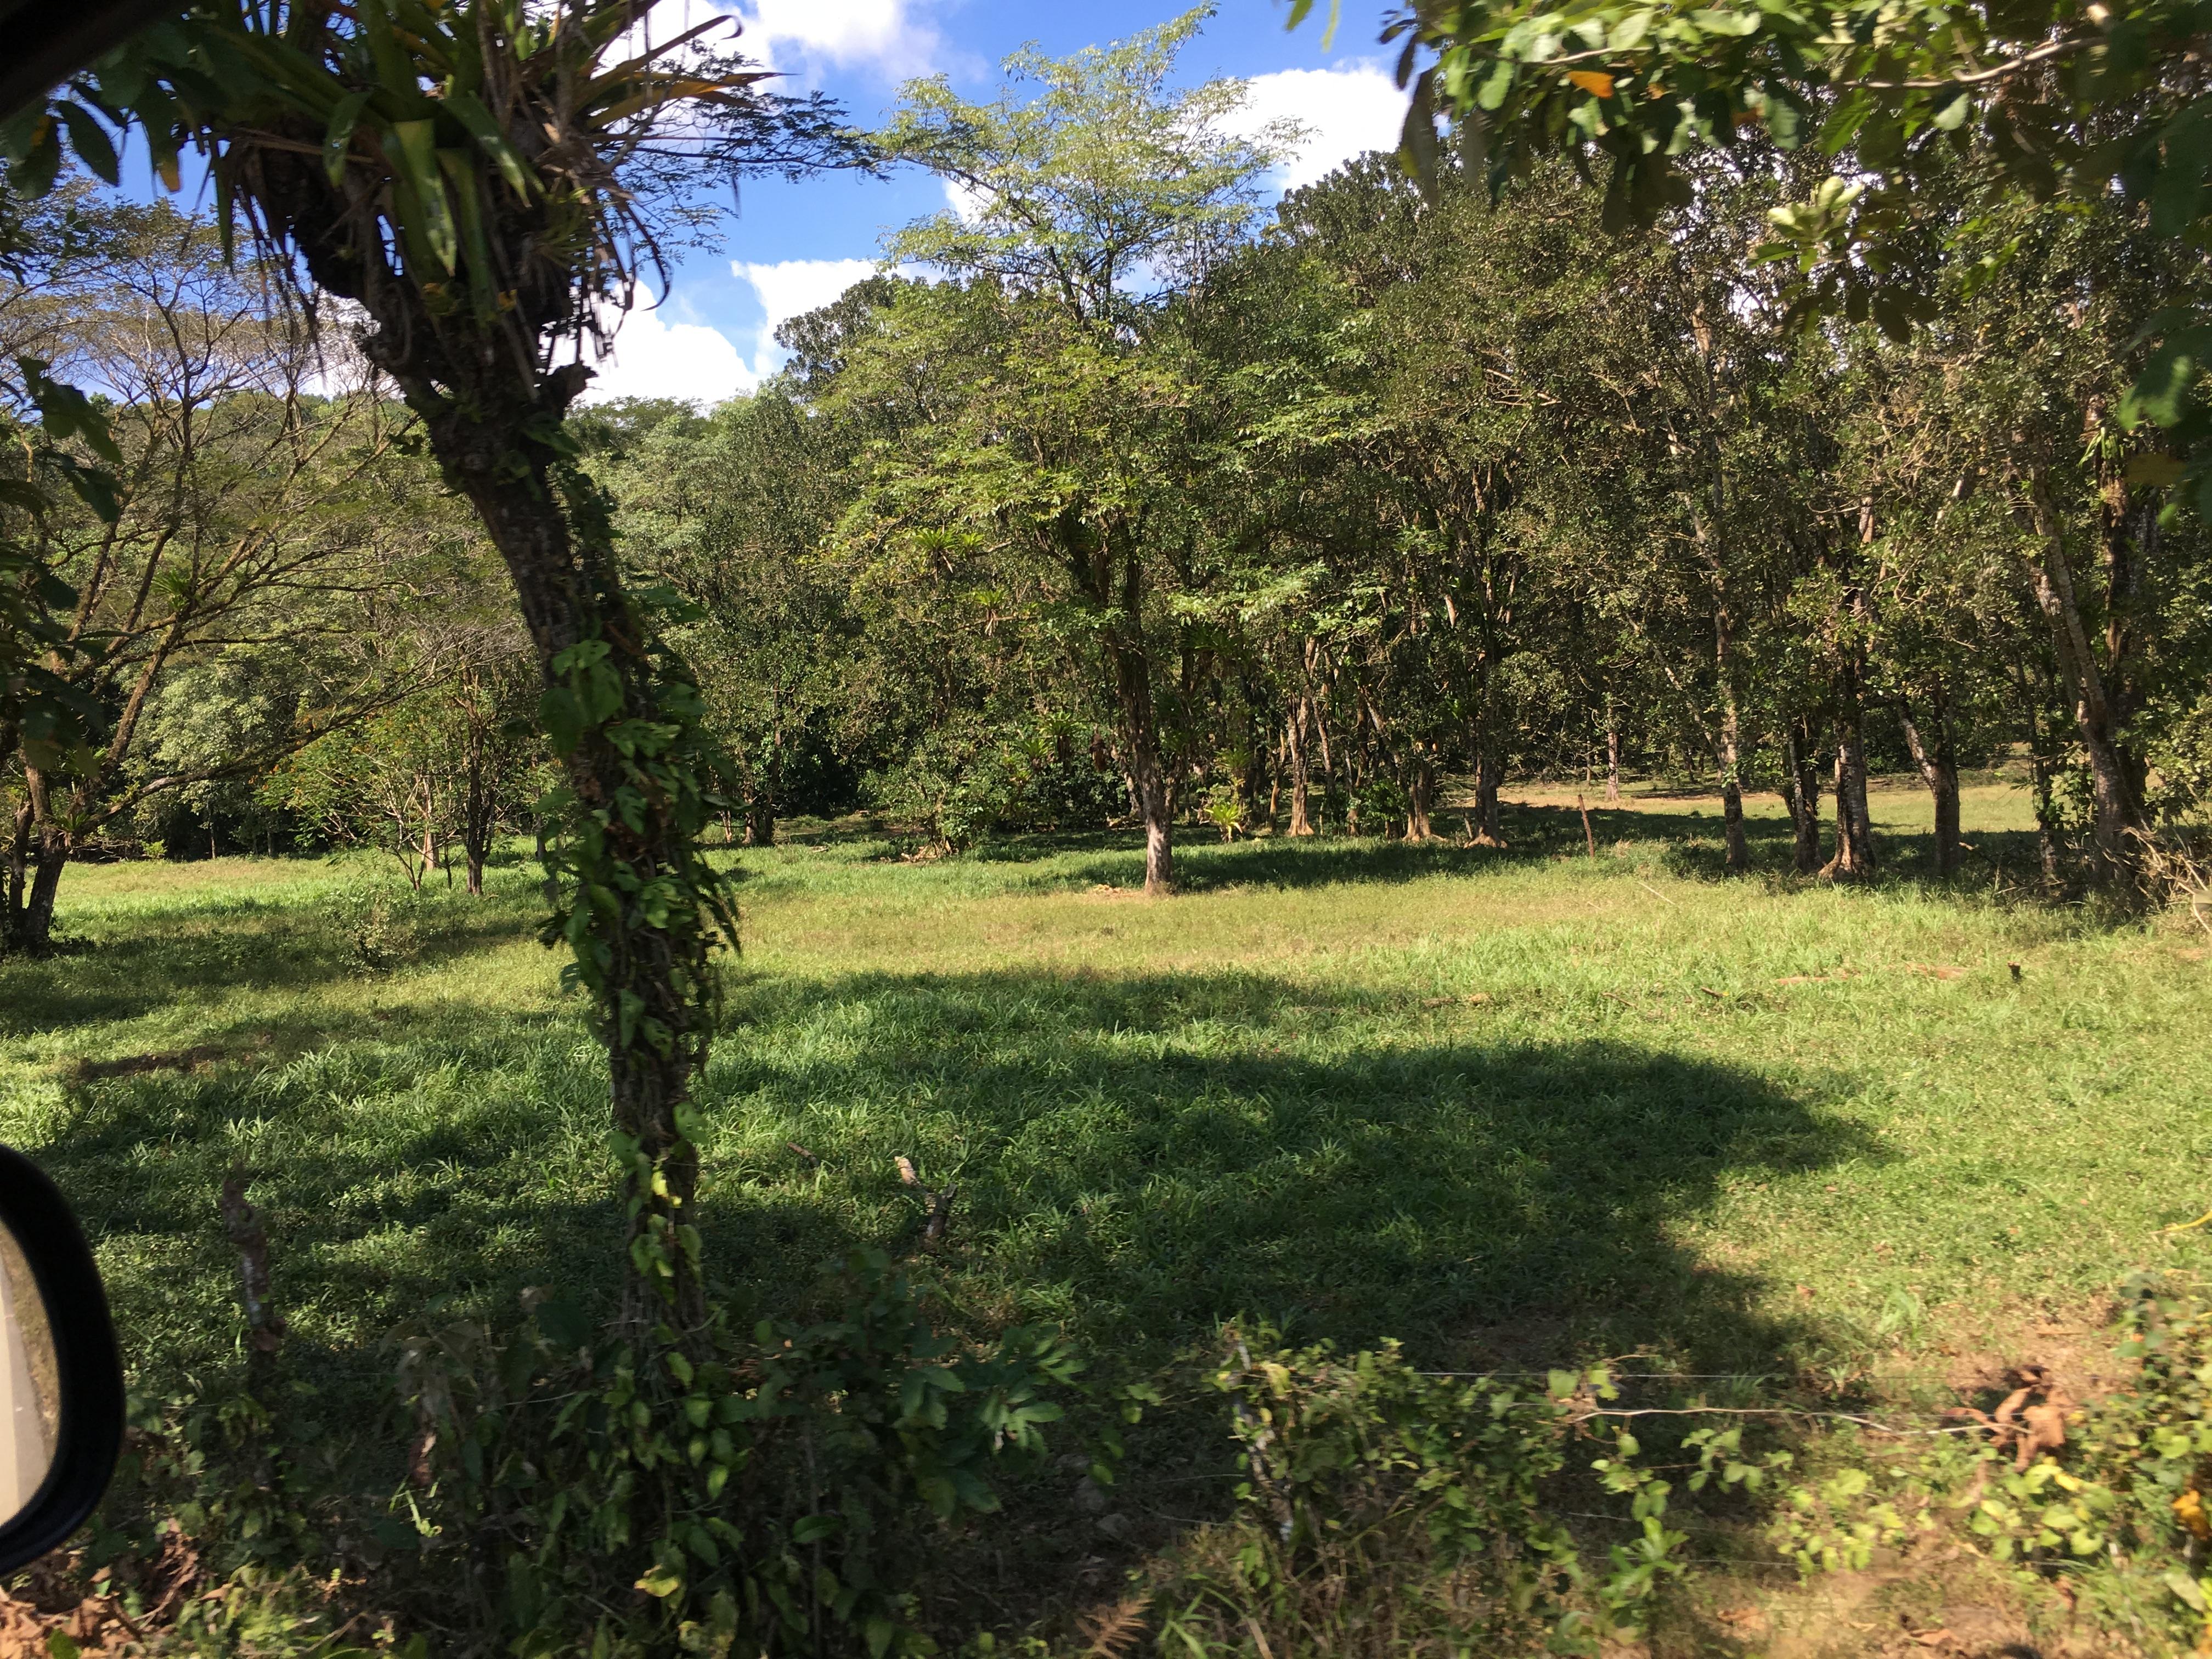 Dominical-Costa-Rica-property-costaricarealestateDOM331-6.jpg